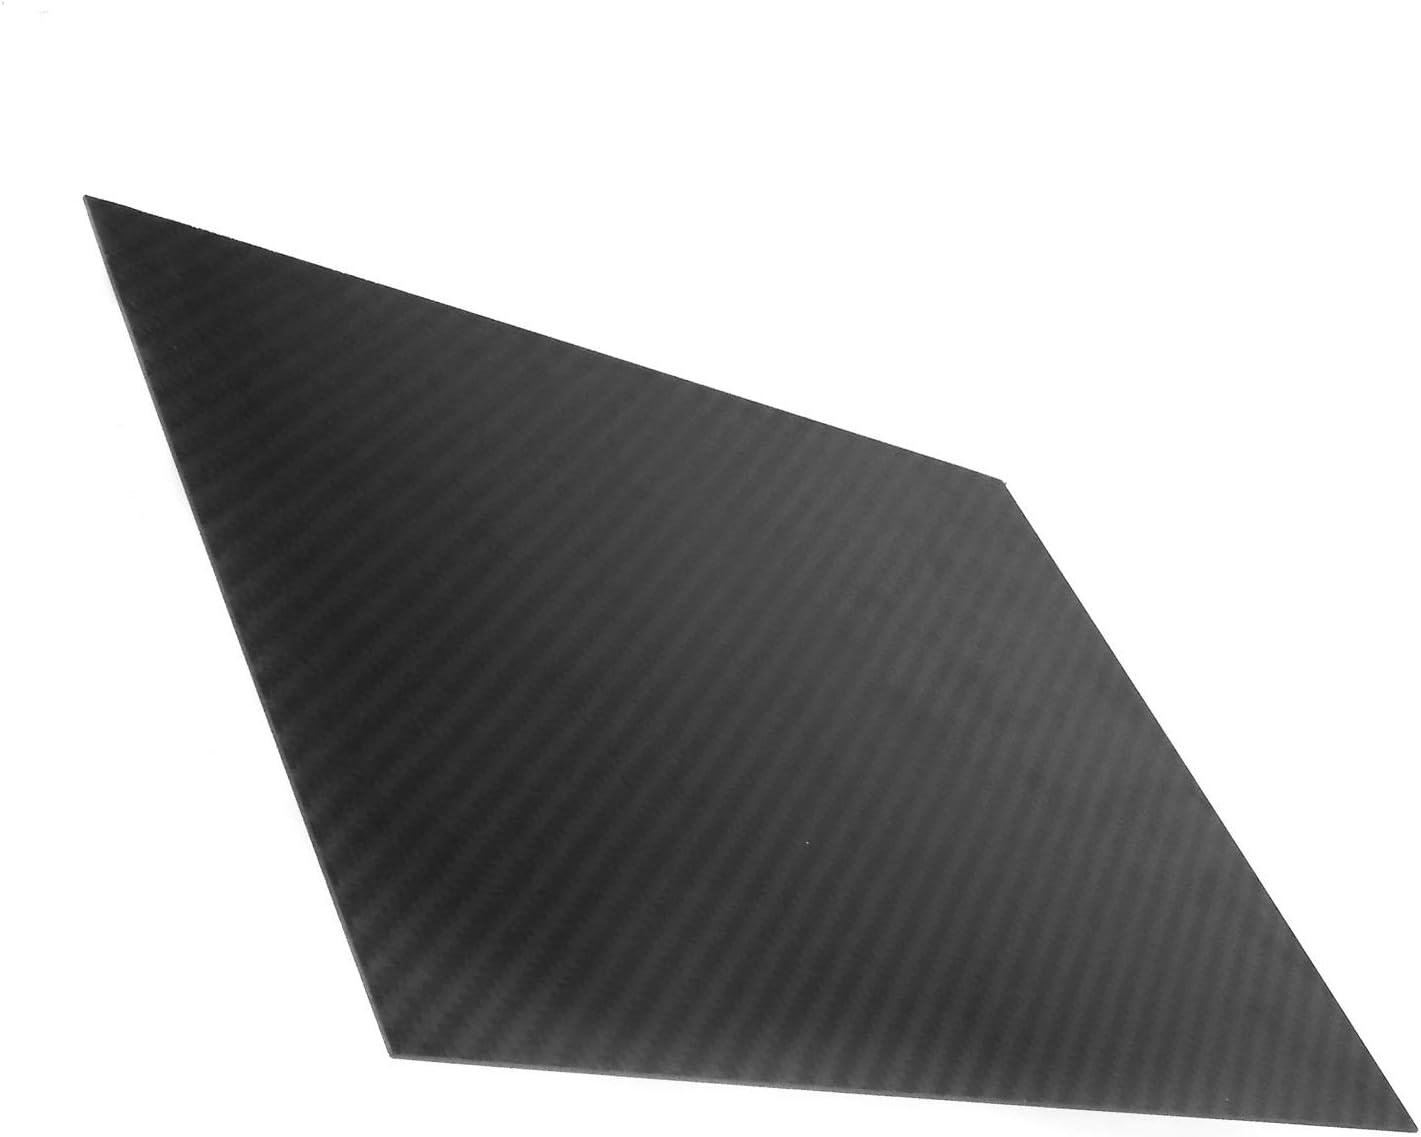 3 x SBM Uddeholm Holzs/ägeband 3380 x 10 x 0,7 mm mit 6 mm Zahnabstand Bands/ägeblatt